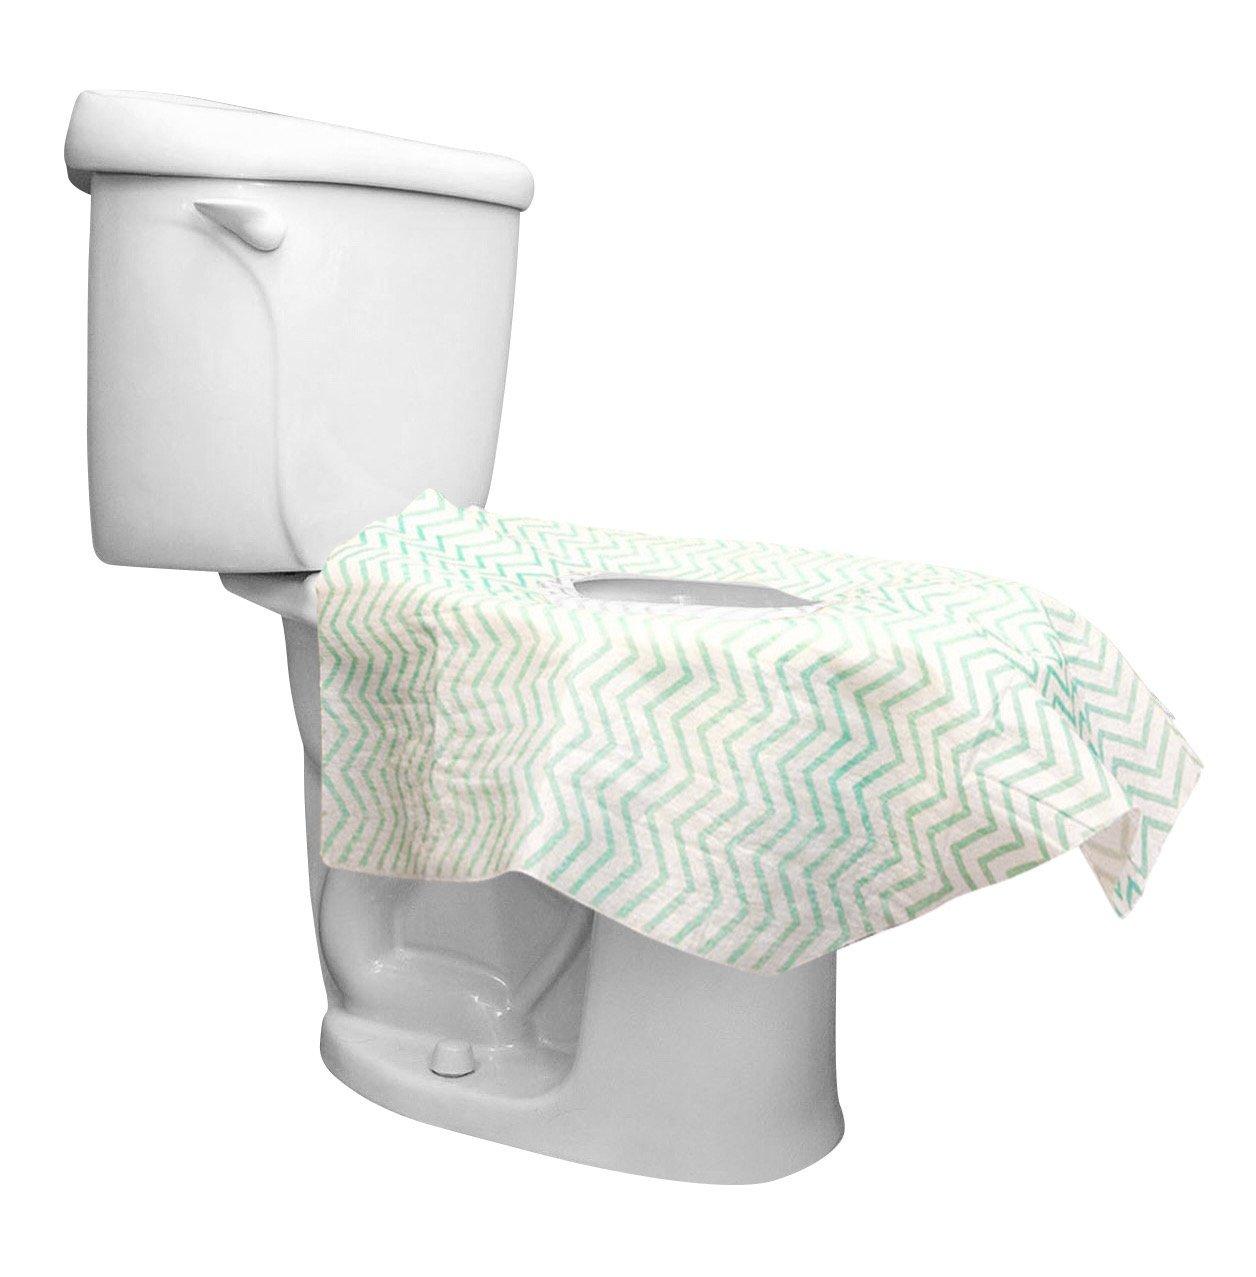 Phenomenal Buy Portable Bio Degradable Disposable Toilet Flipup Creativecarmelina Interior Chair Design Creativecarmelinacom